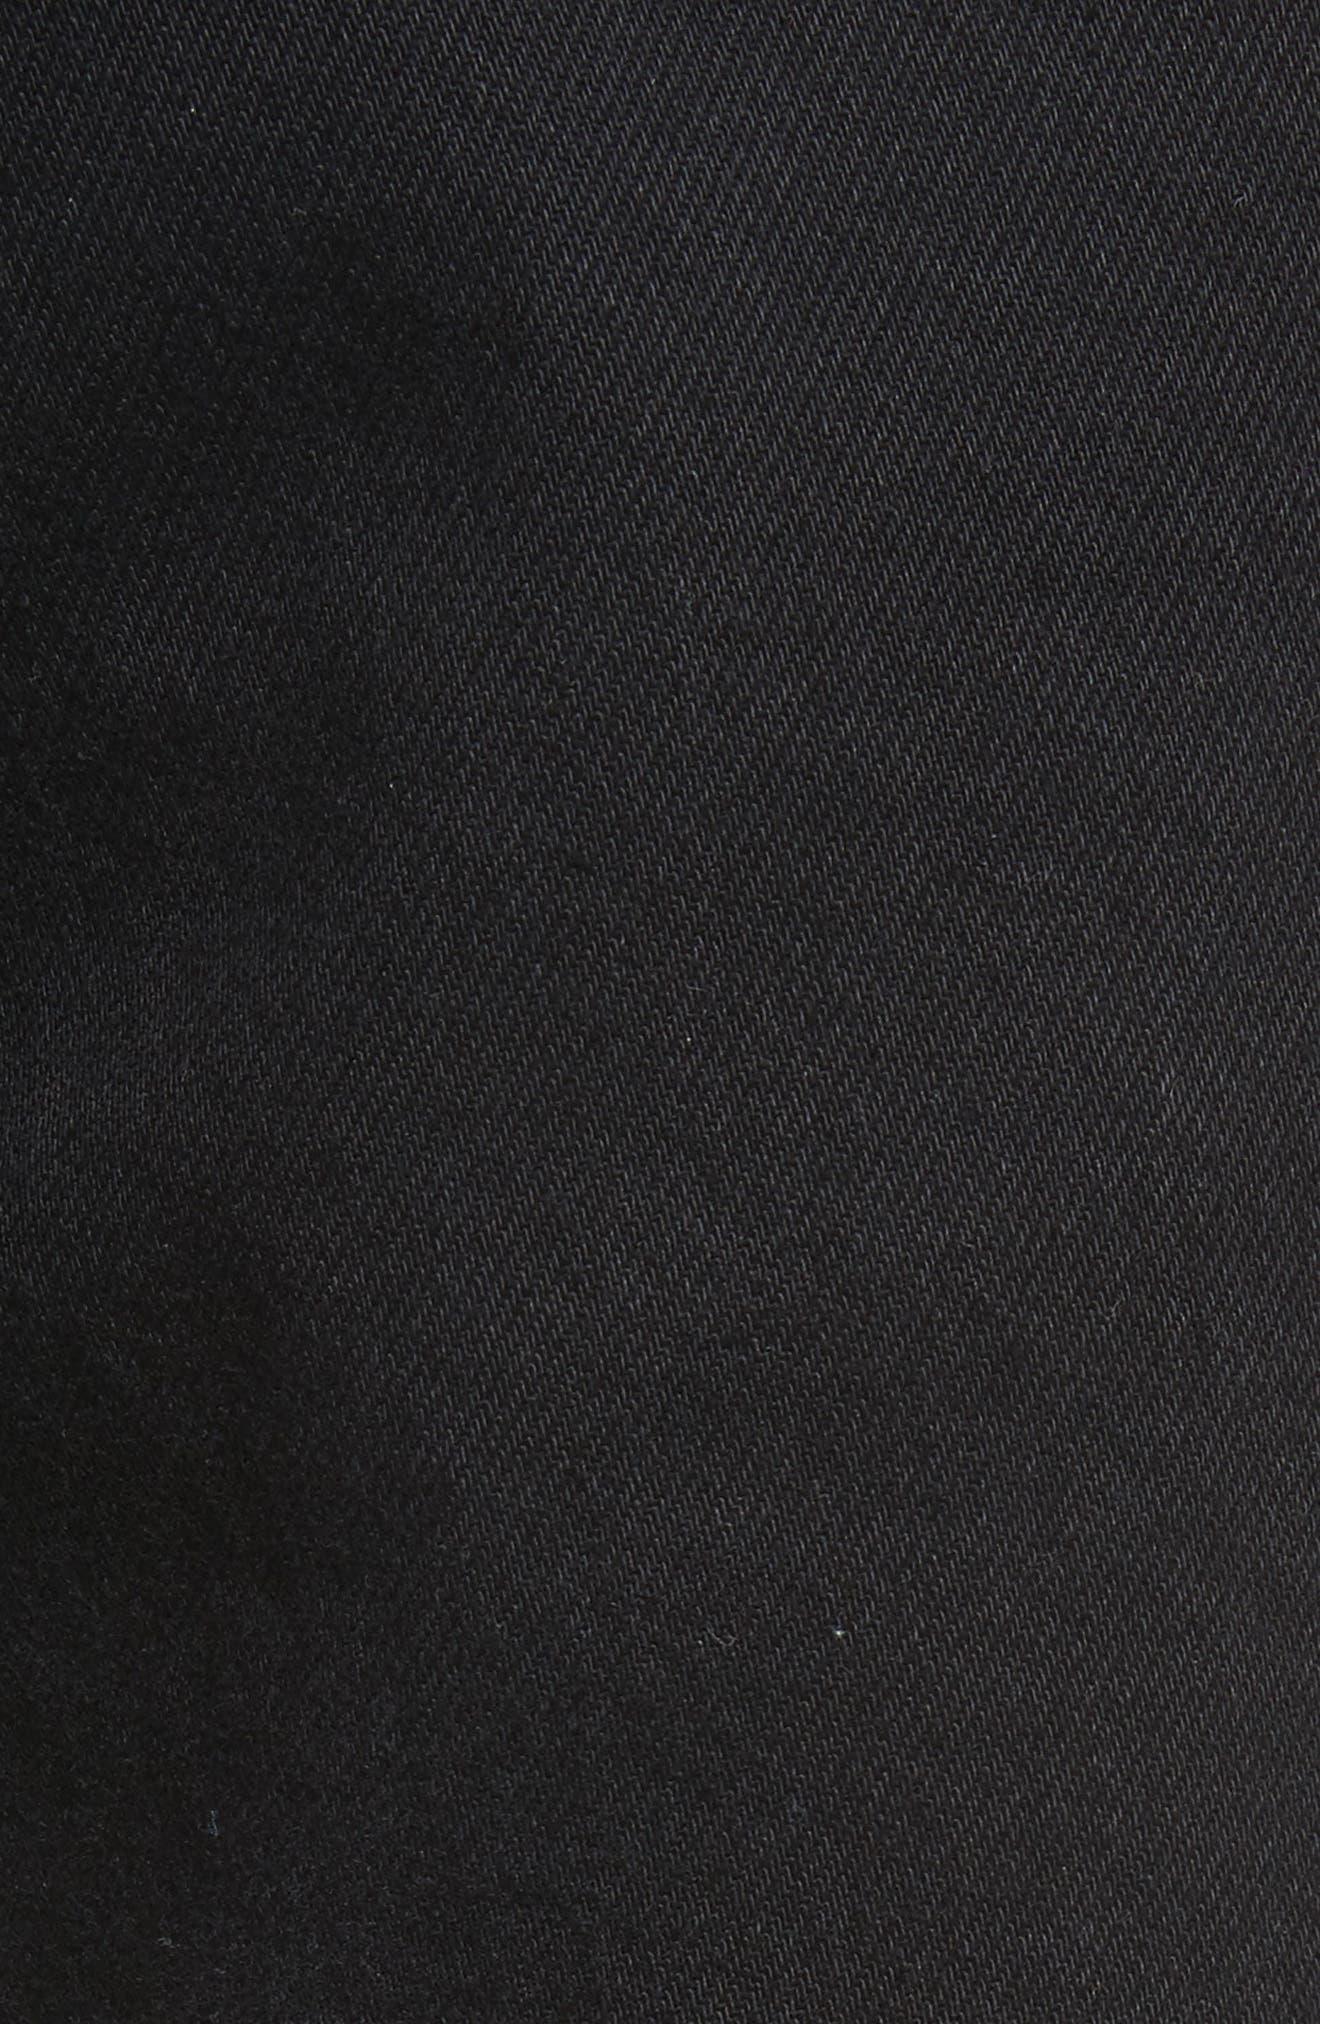 Silk Knee Patch Straight Leg Jeans,                             Alternate thumbnail 7, color,                             Black